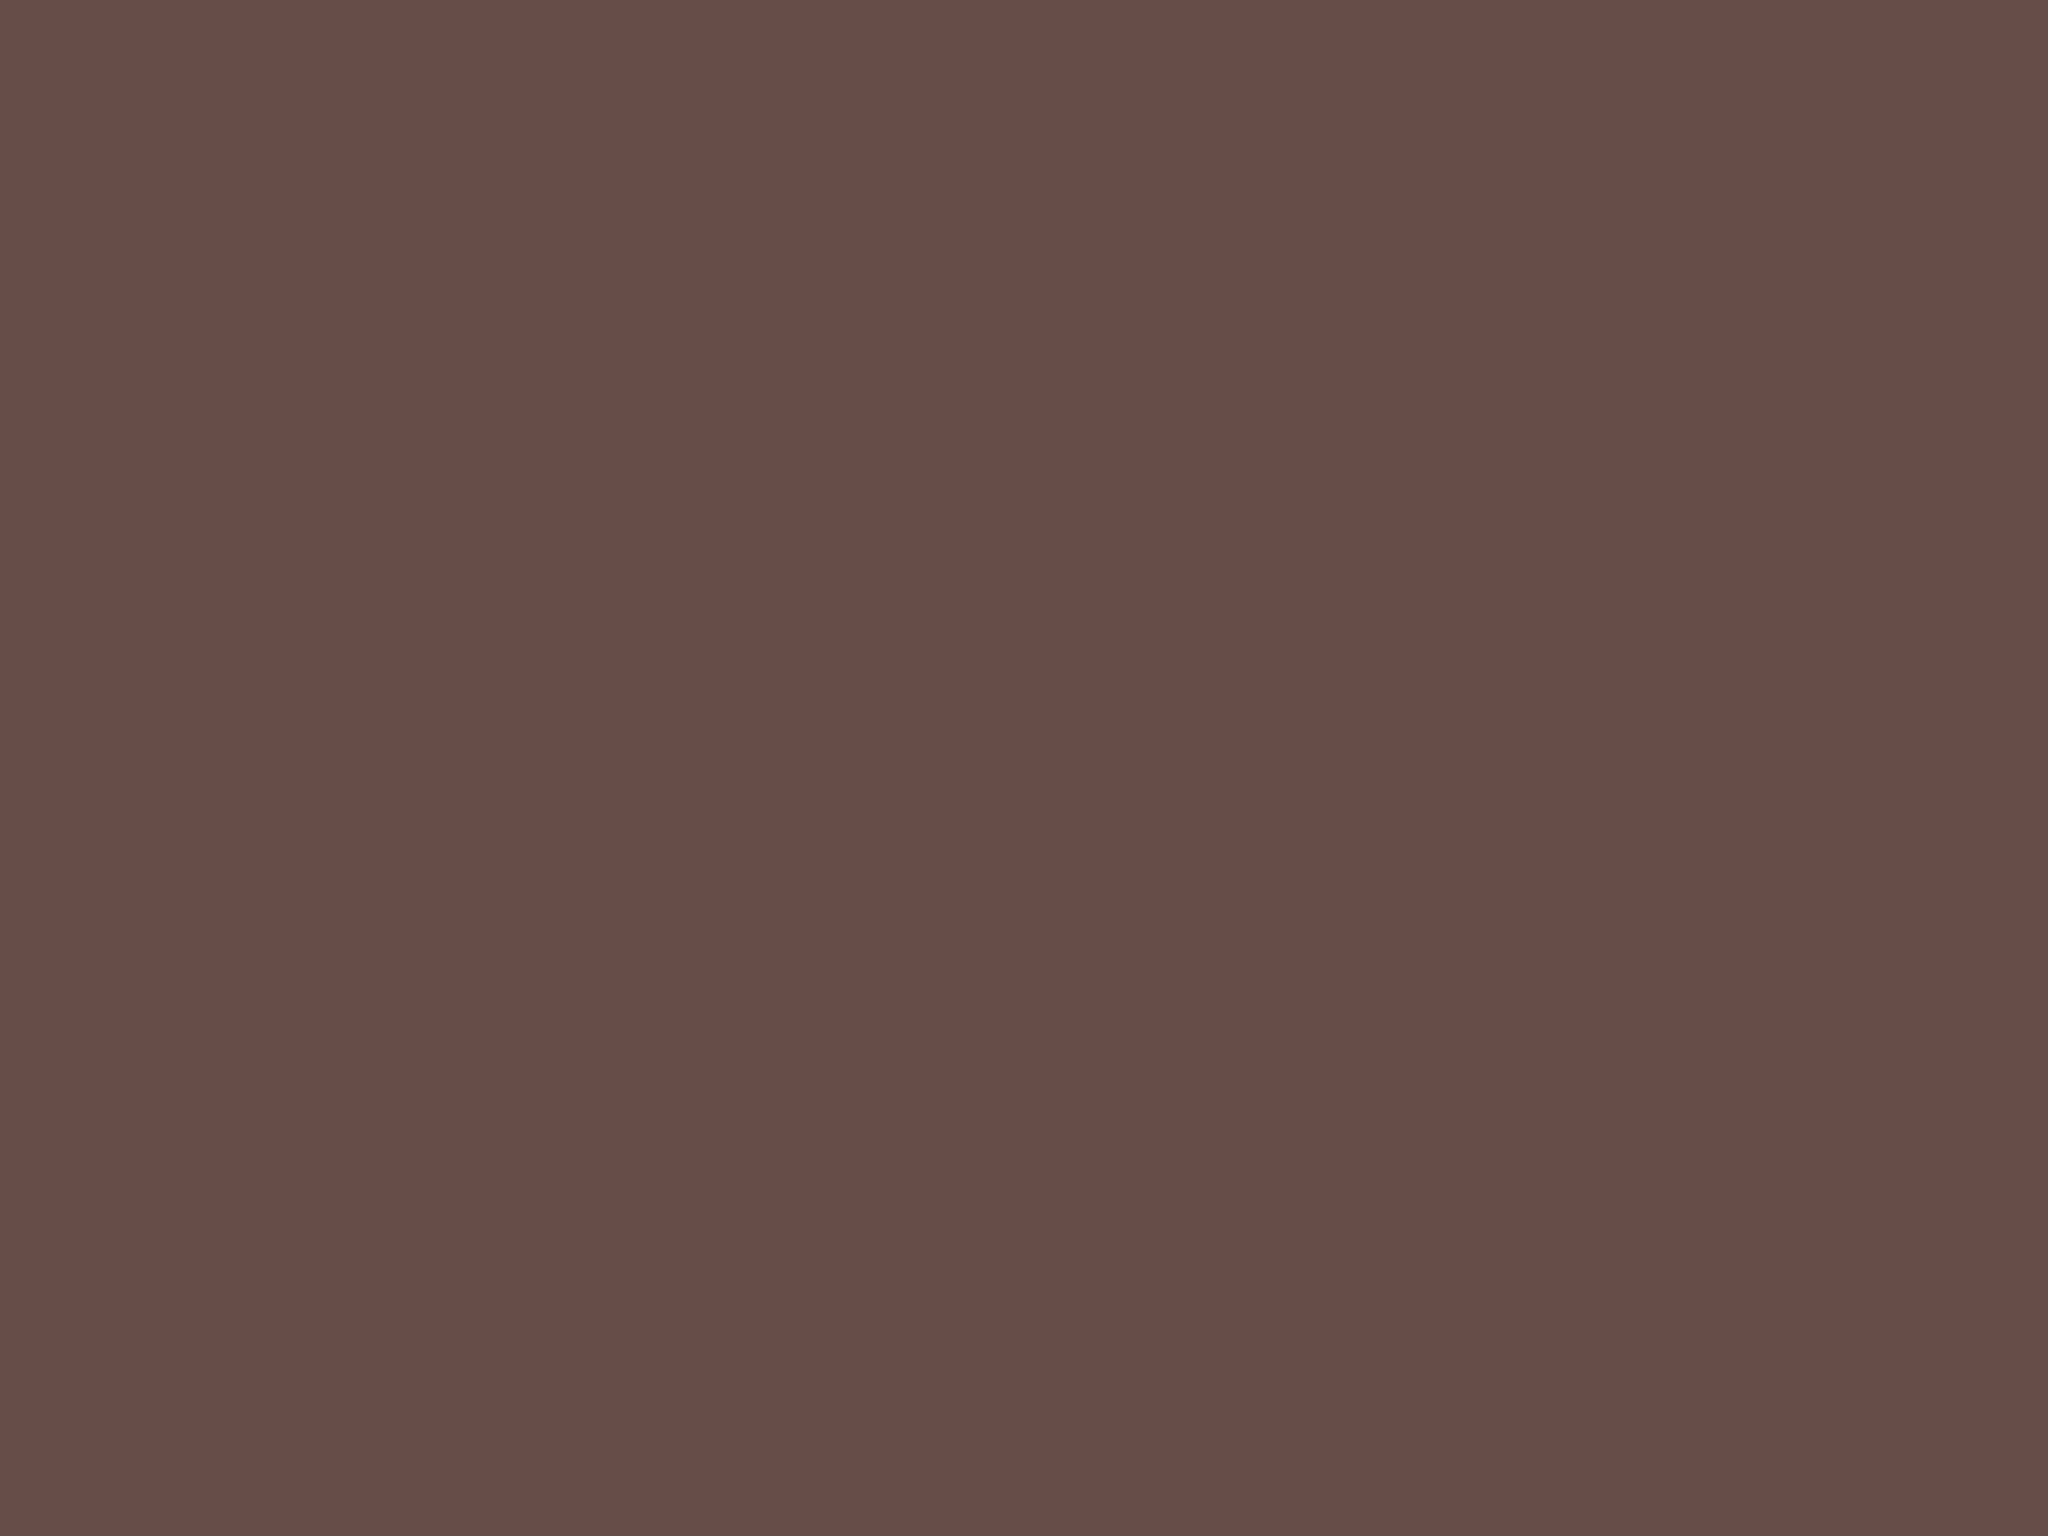 2048x1536 Liver Solid Color Background